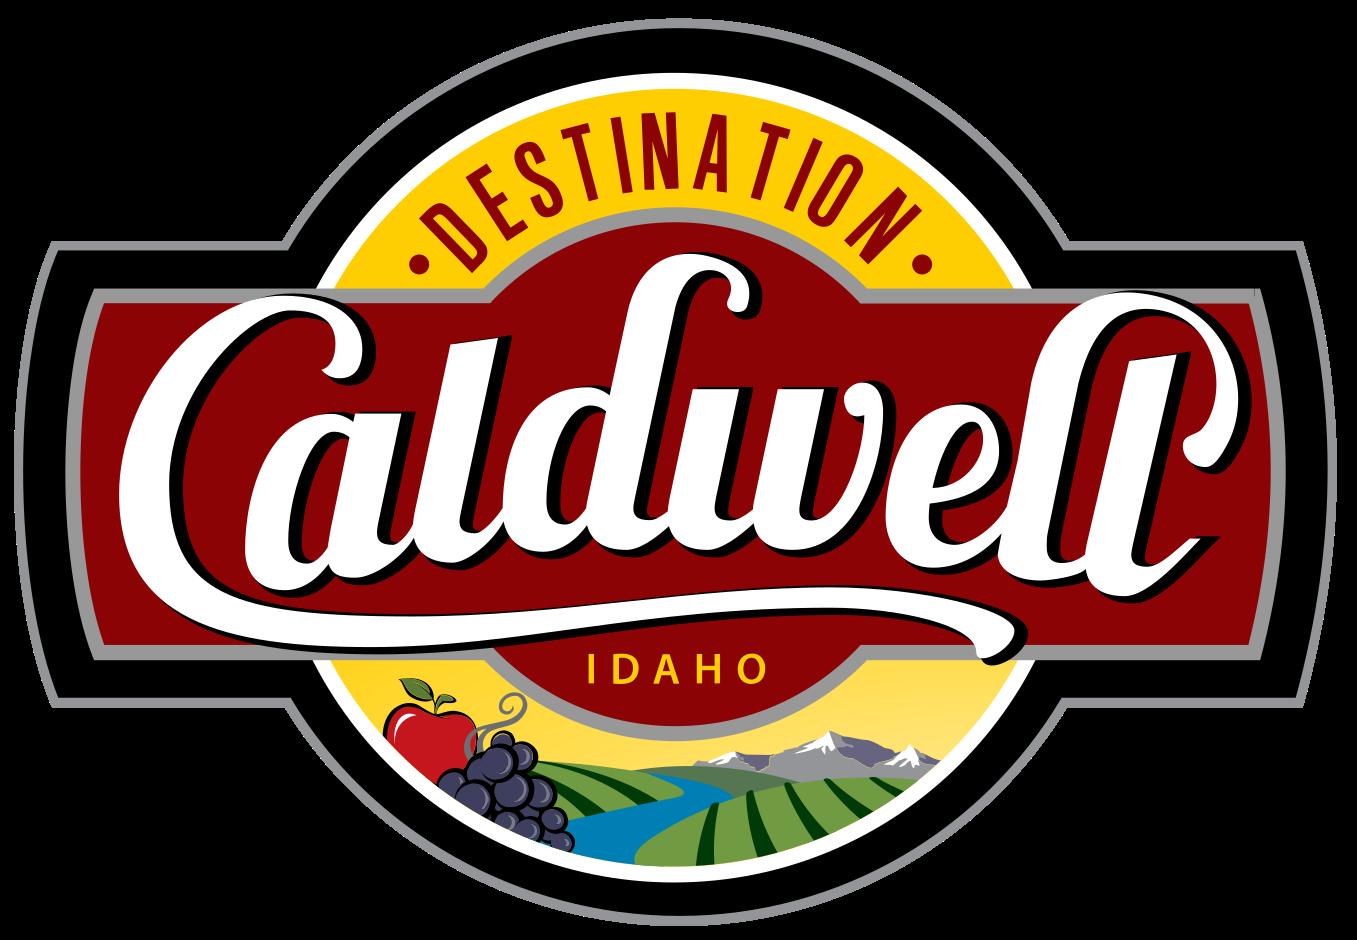 Destination Caldwell logo